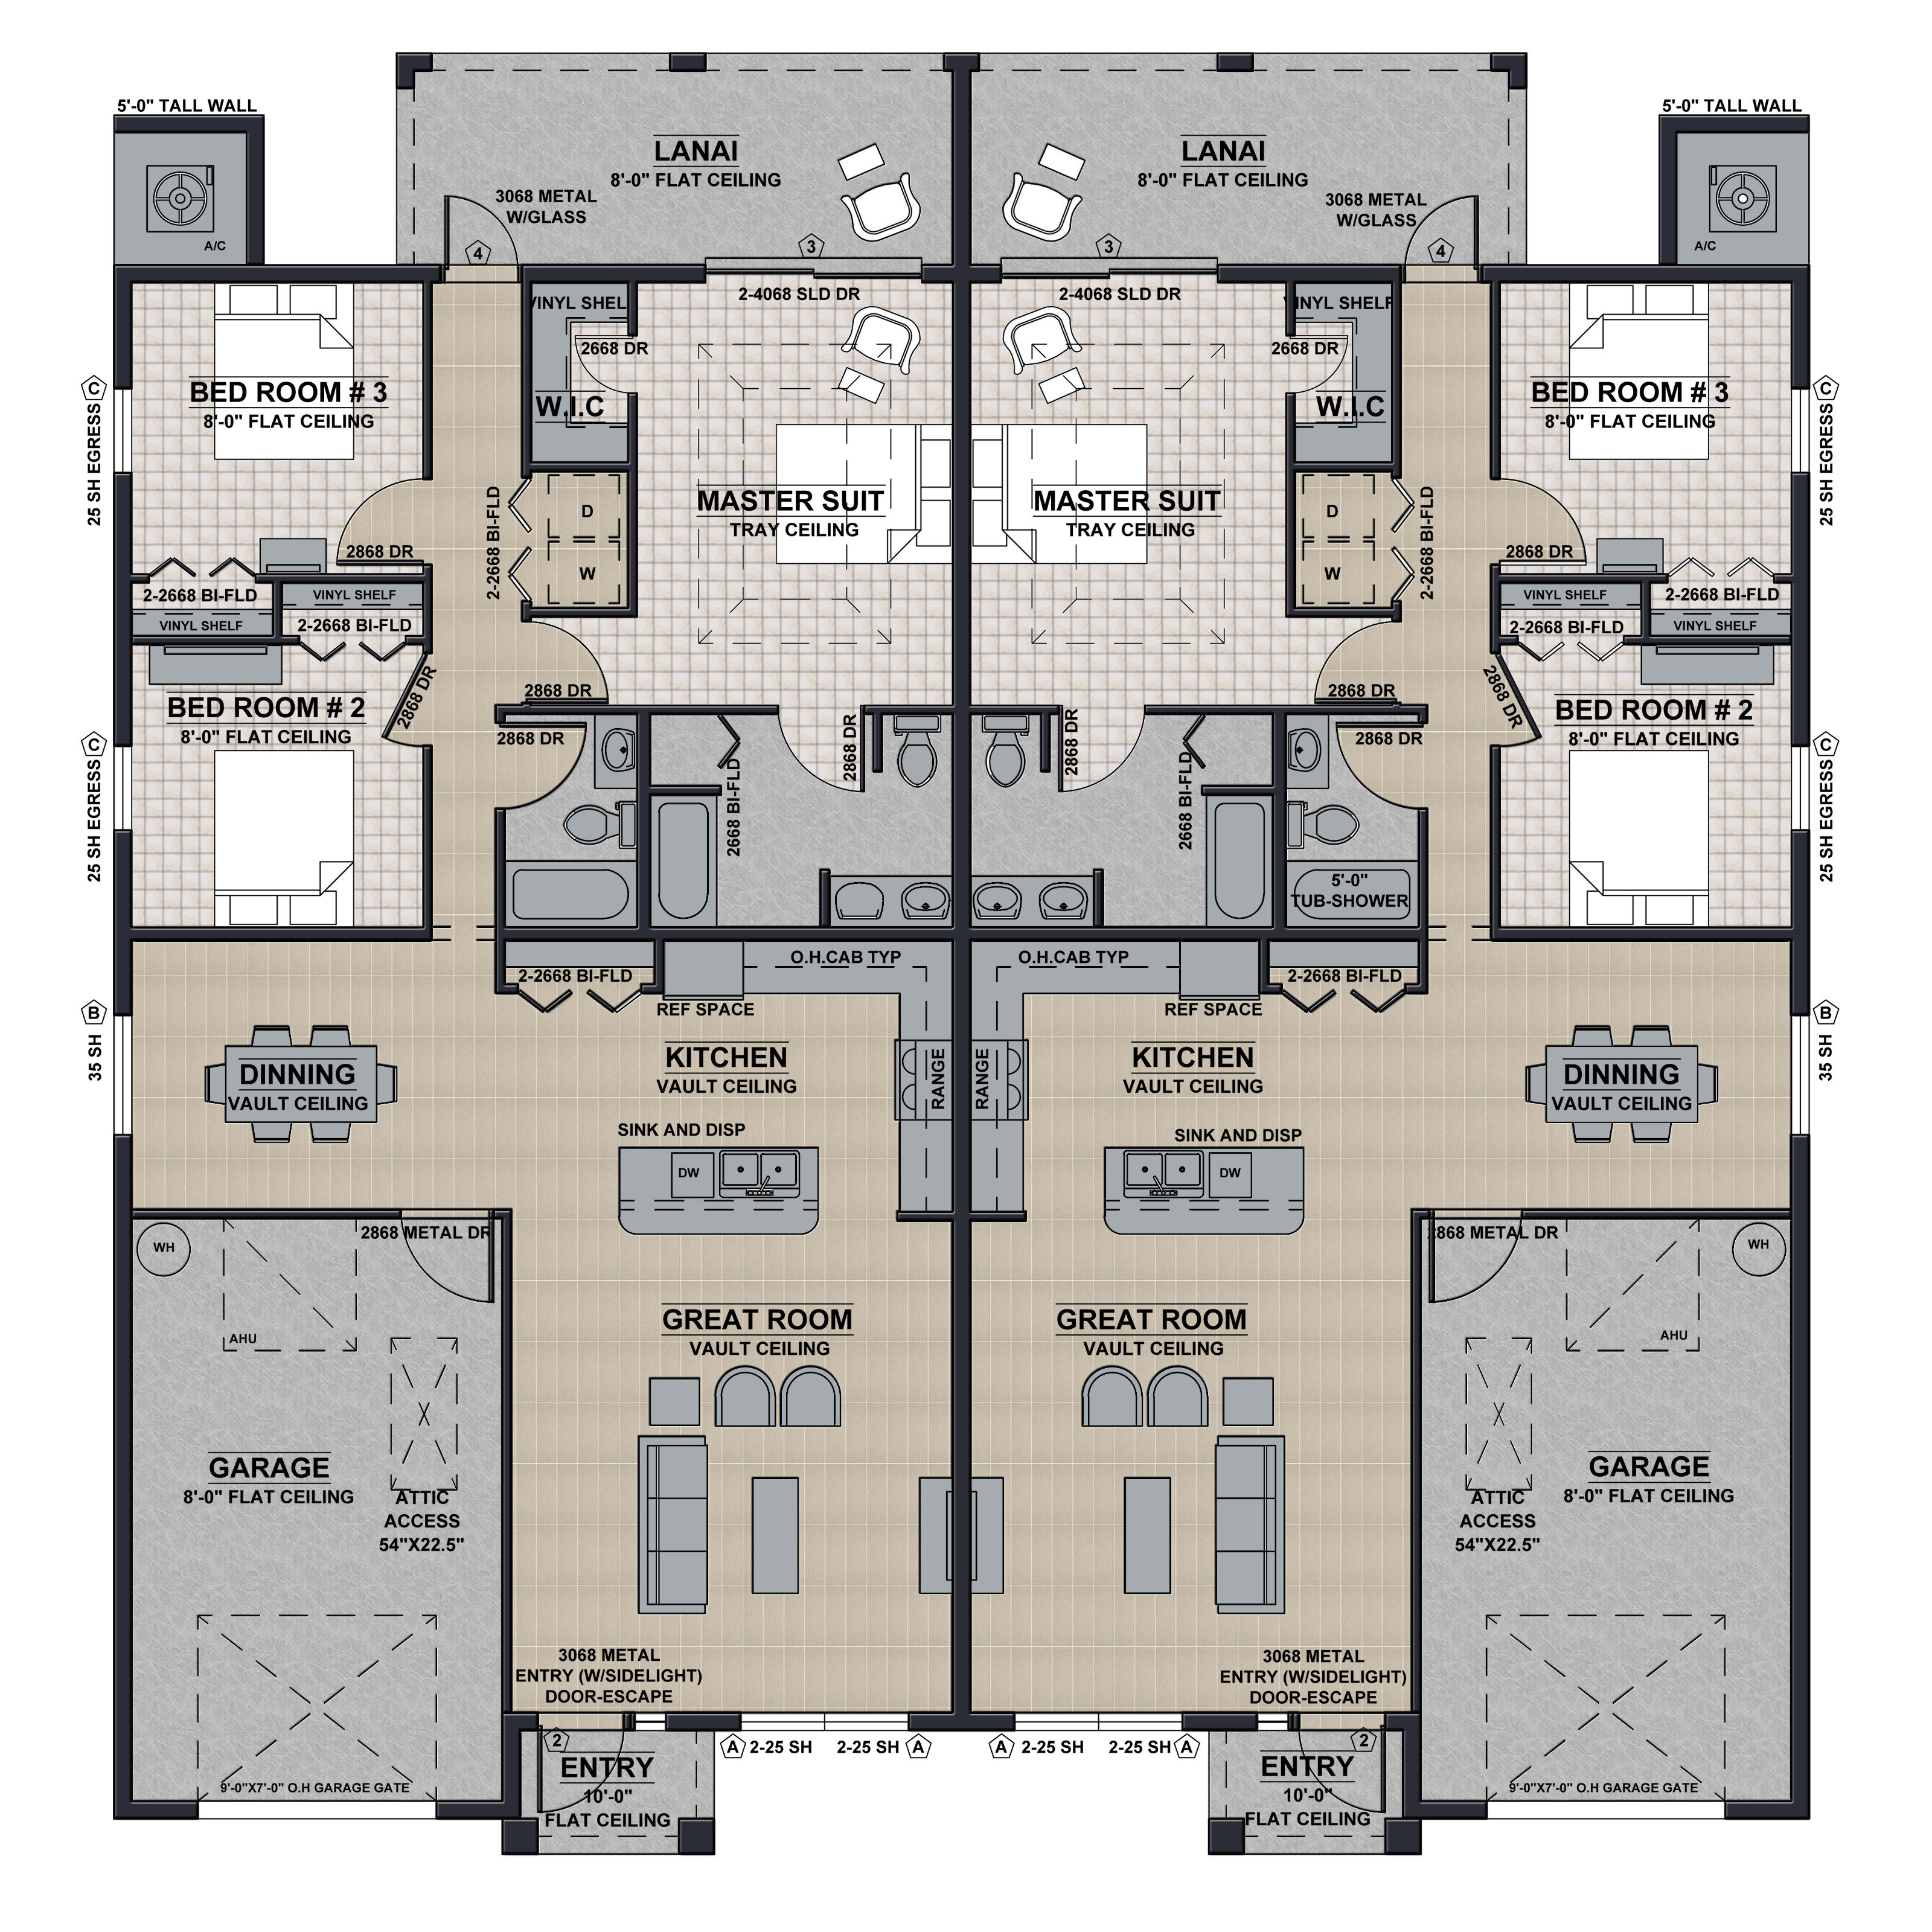 Design 2d Floor Plan On Autocad And Adobe Illustrator By Zoyagul40 Fiverr